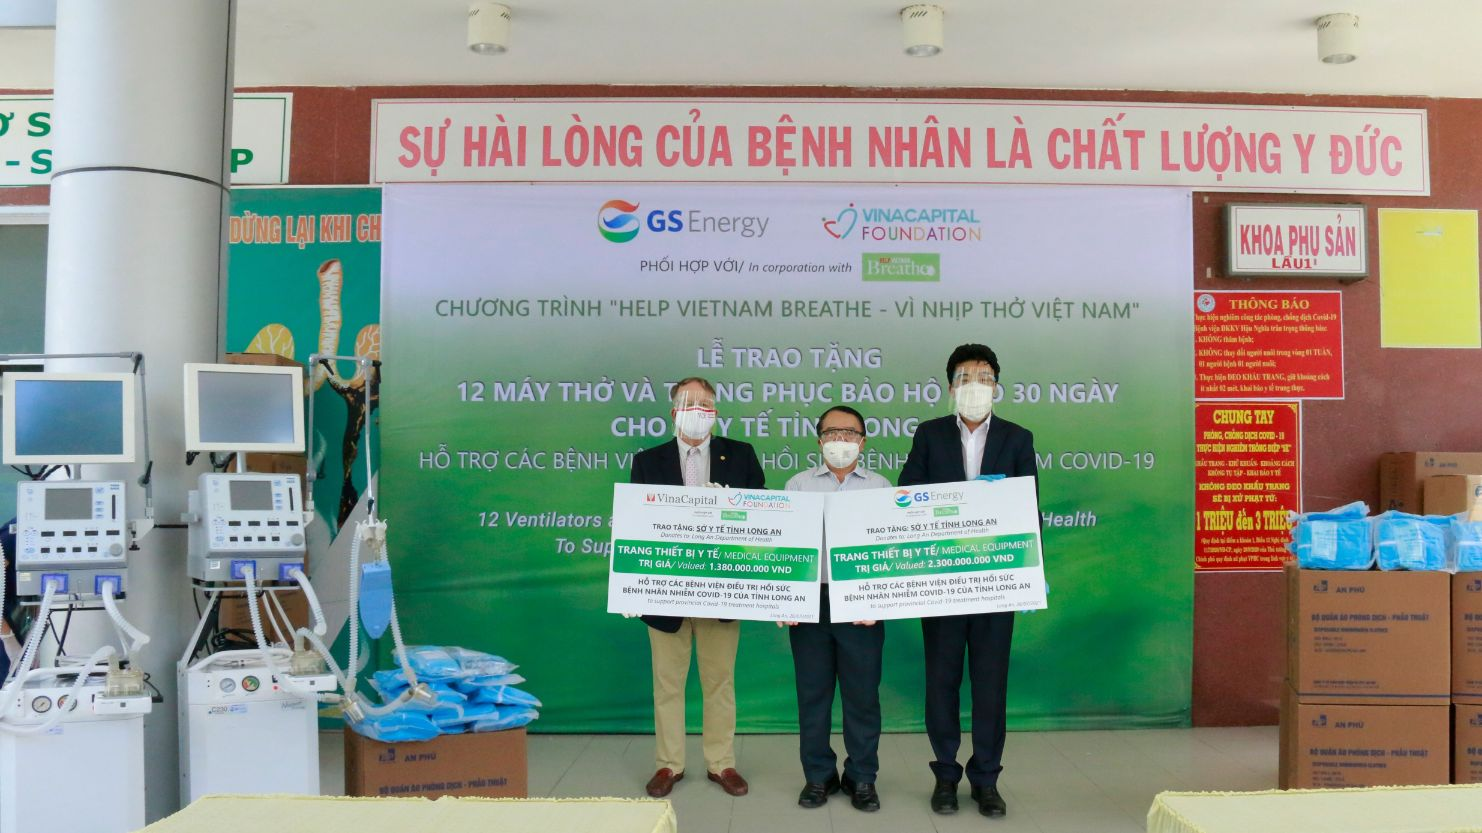 Dai Dien Gs Energy Va Vcf Trao Bang Tai Tro Tuong Trung Cho Dai Dien So Y Te Tinh Long An 1 1